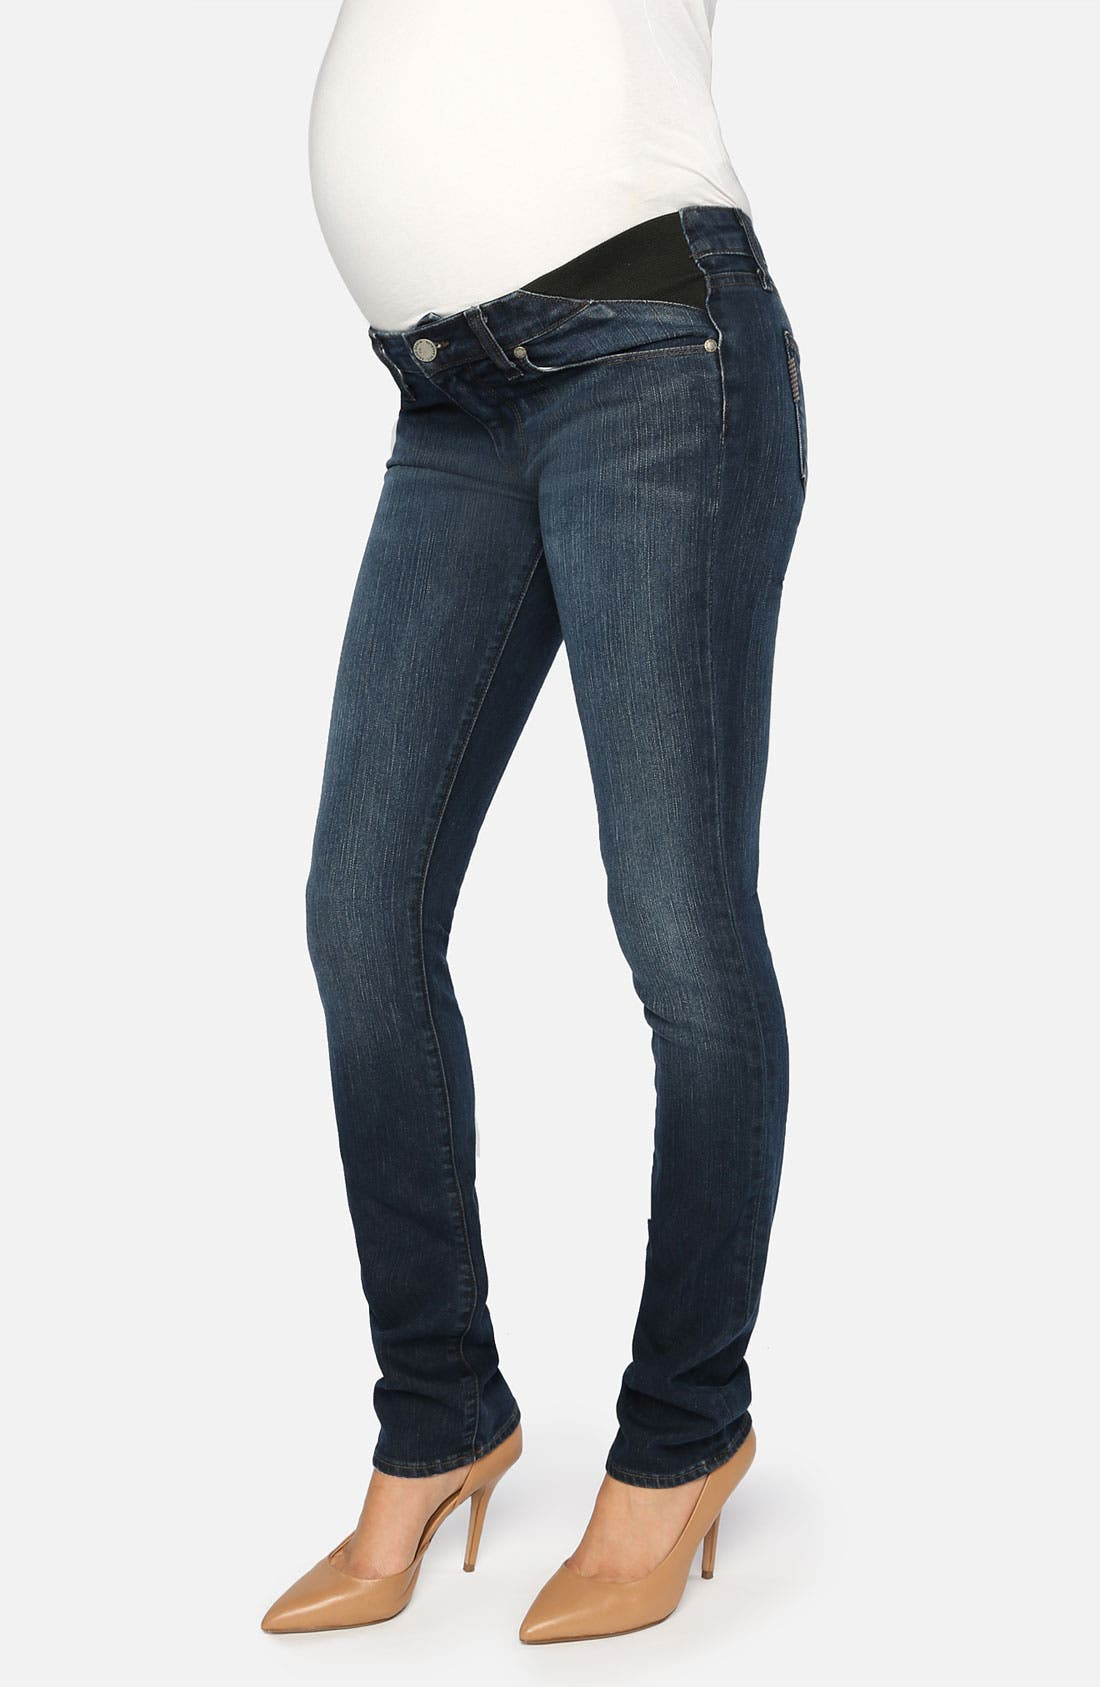 Alternate Image 1 Selected - Paige Denim 'Union Skyline' Skinny Leg Maternity Jeans (Amethyst)